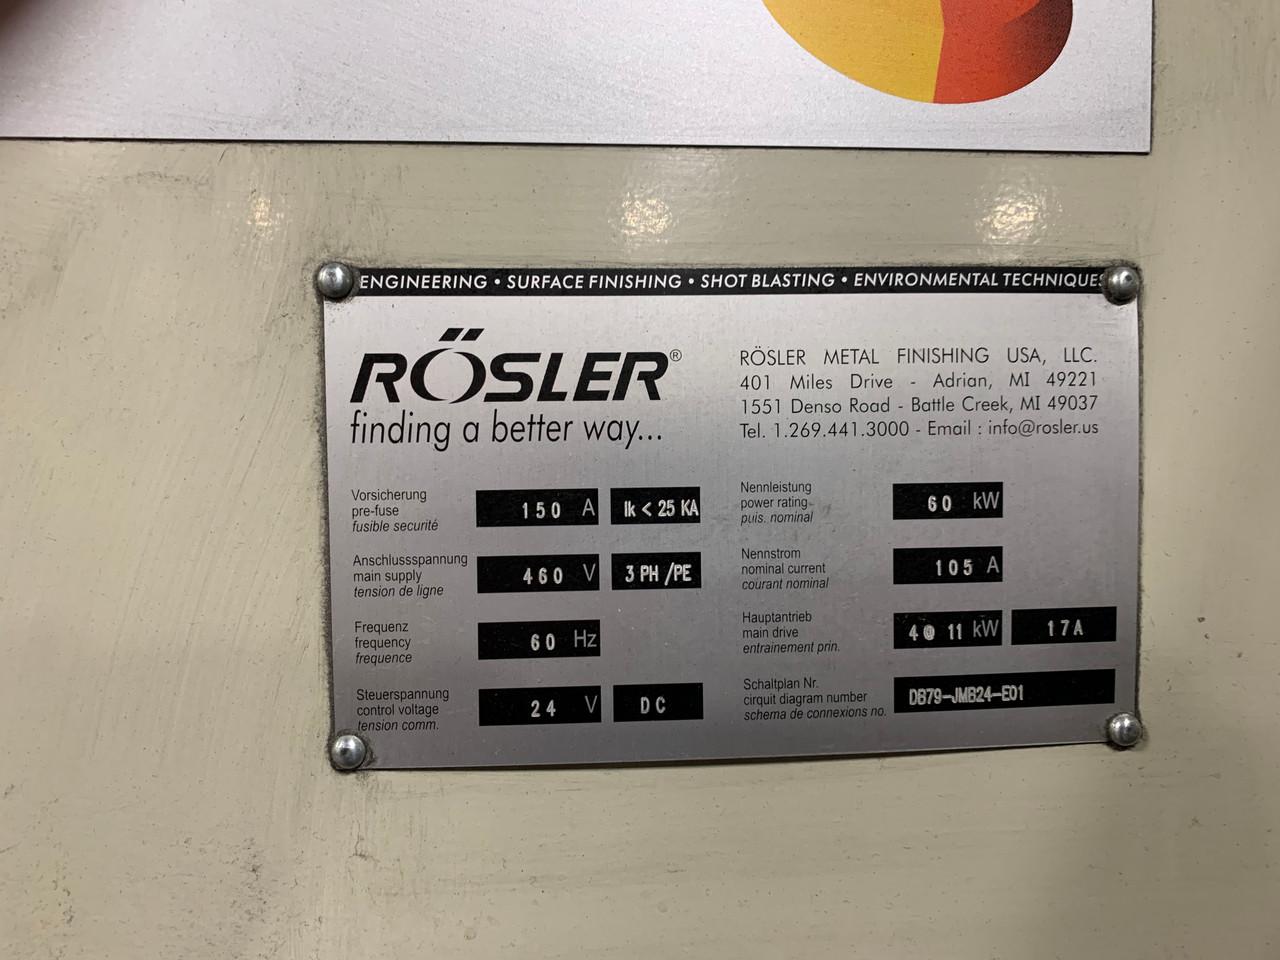 Rosler Wire Belt Blast Cleaning Machine - Model JMB24x10/4